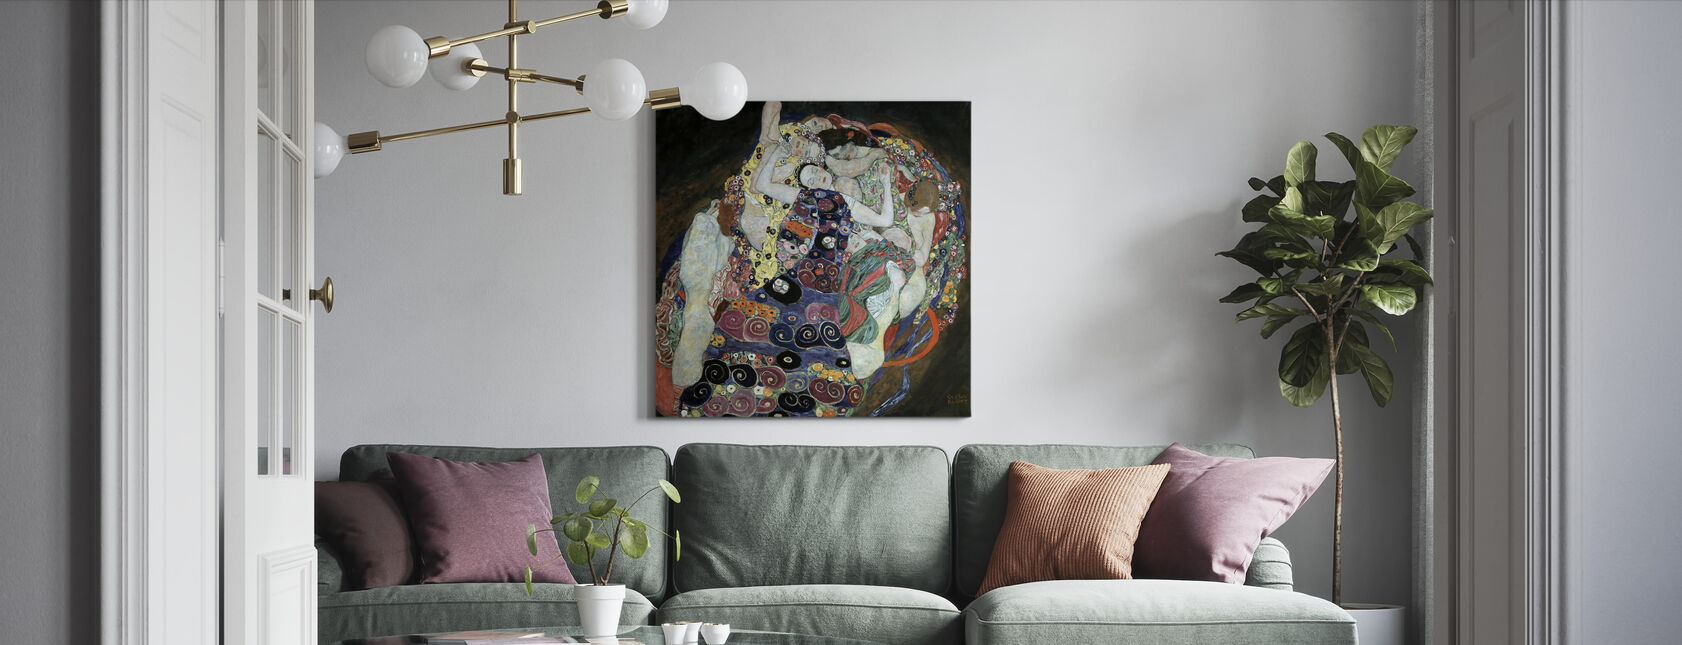 Virgin - Canvas print - Living Room